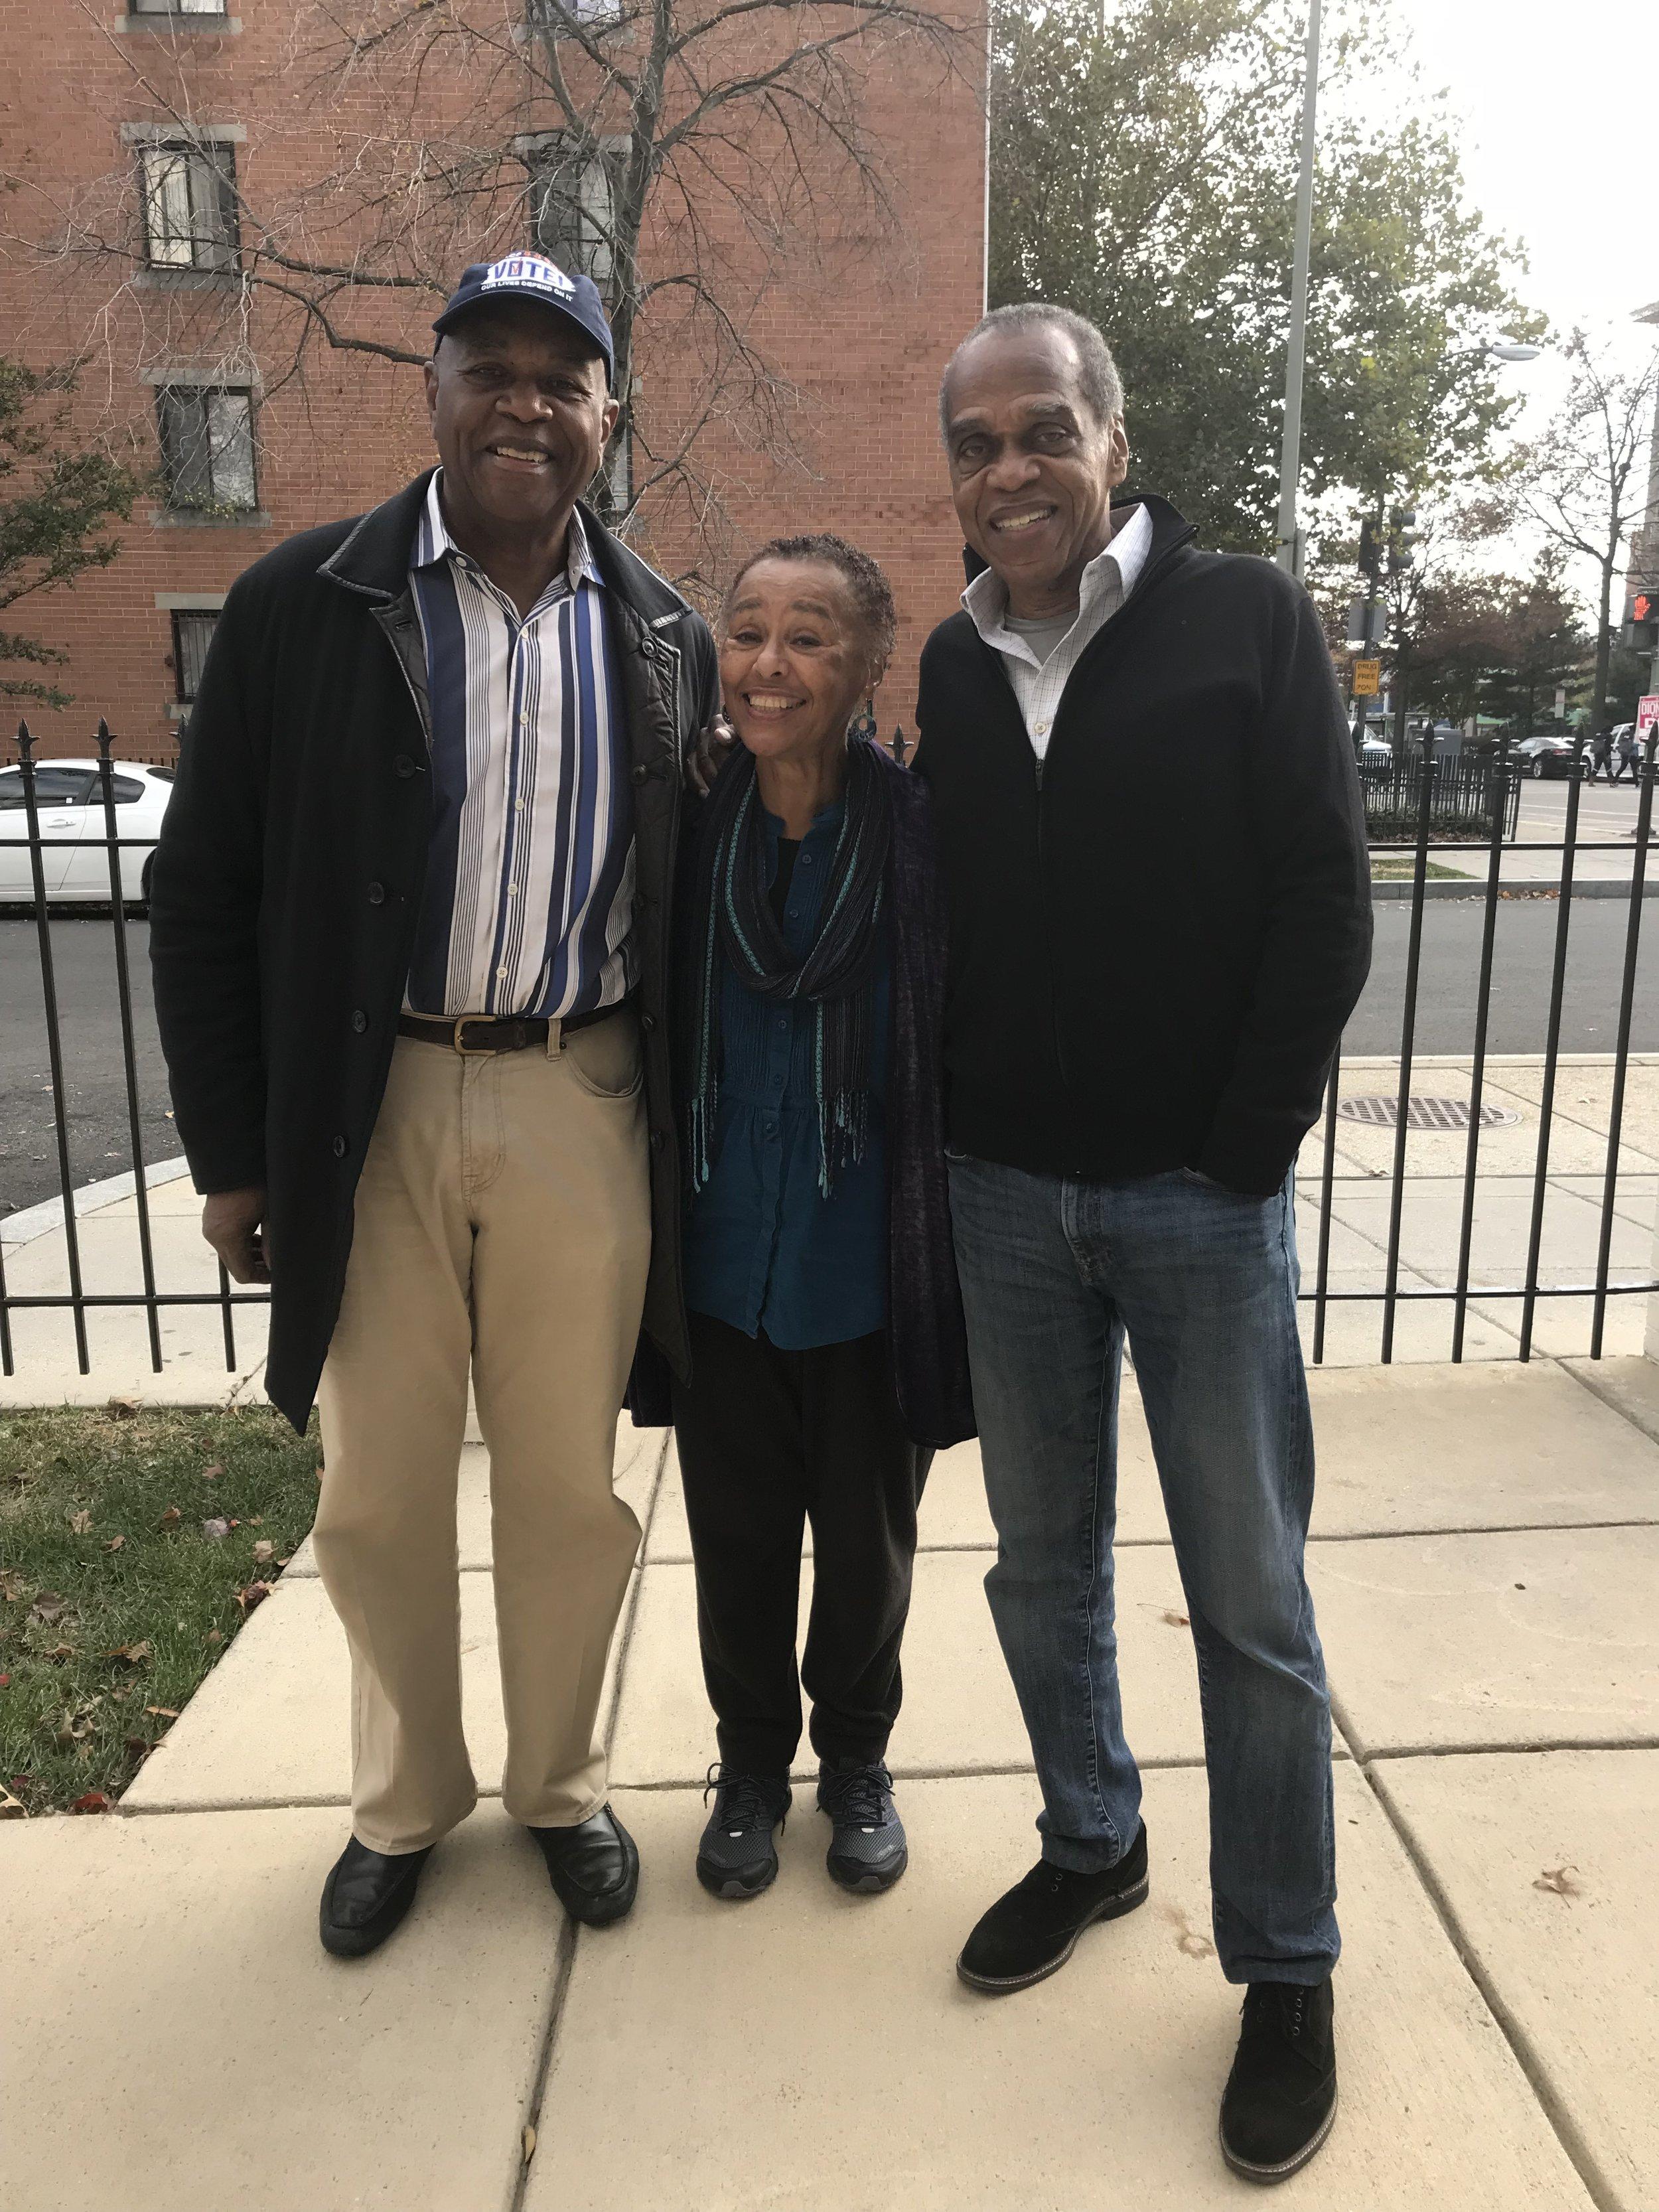 Courtland Cox, Judy Richardson, Tony Gittens. 8 November 2018. Kiyem Ali, photographer.